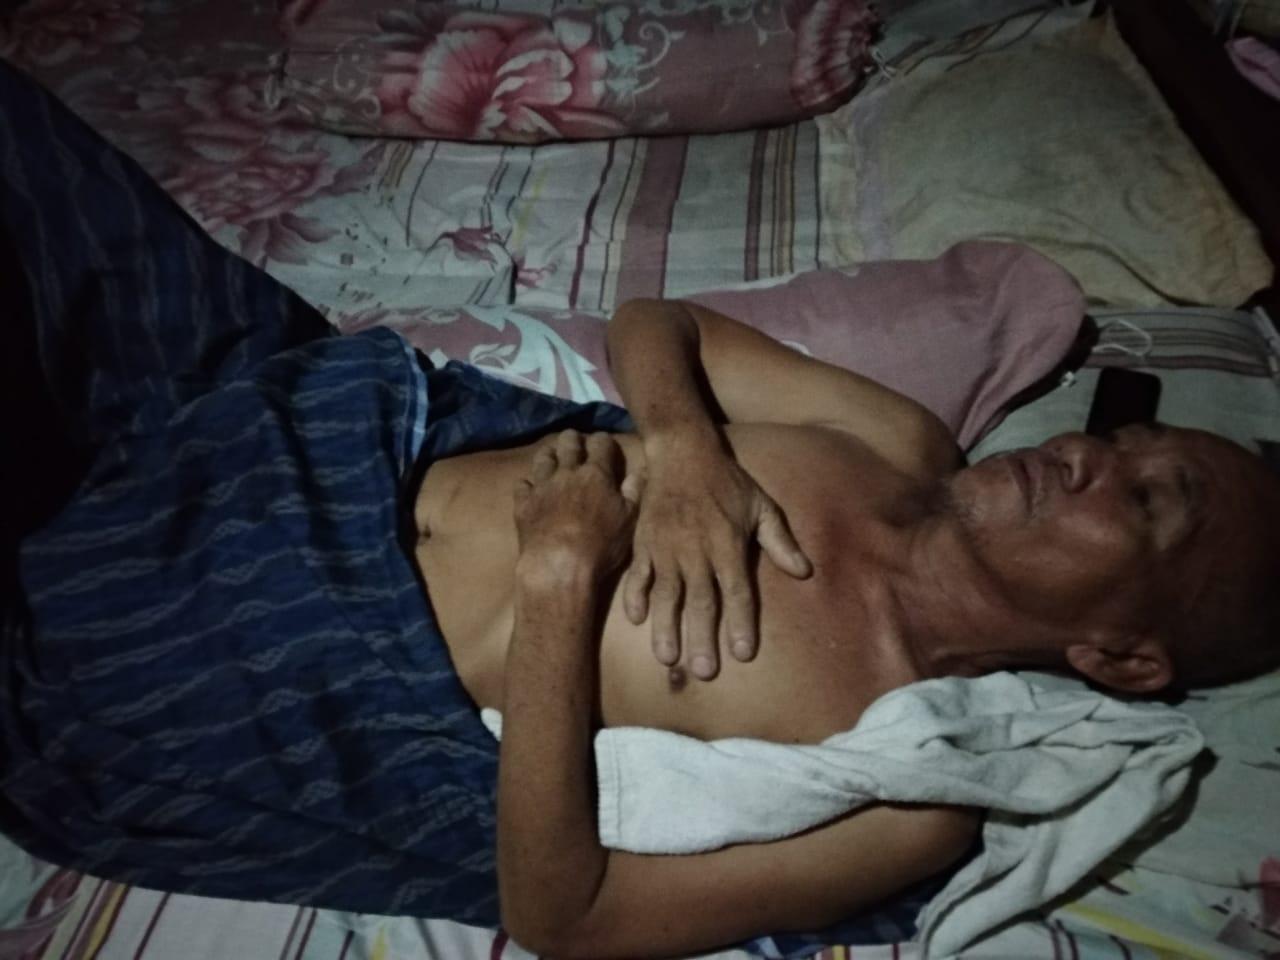 Tidak adanya Biaya, Ayah Abas Sekian Lama Menderita Penyakit TBC